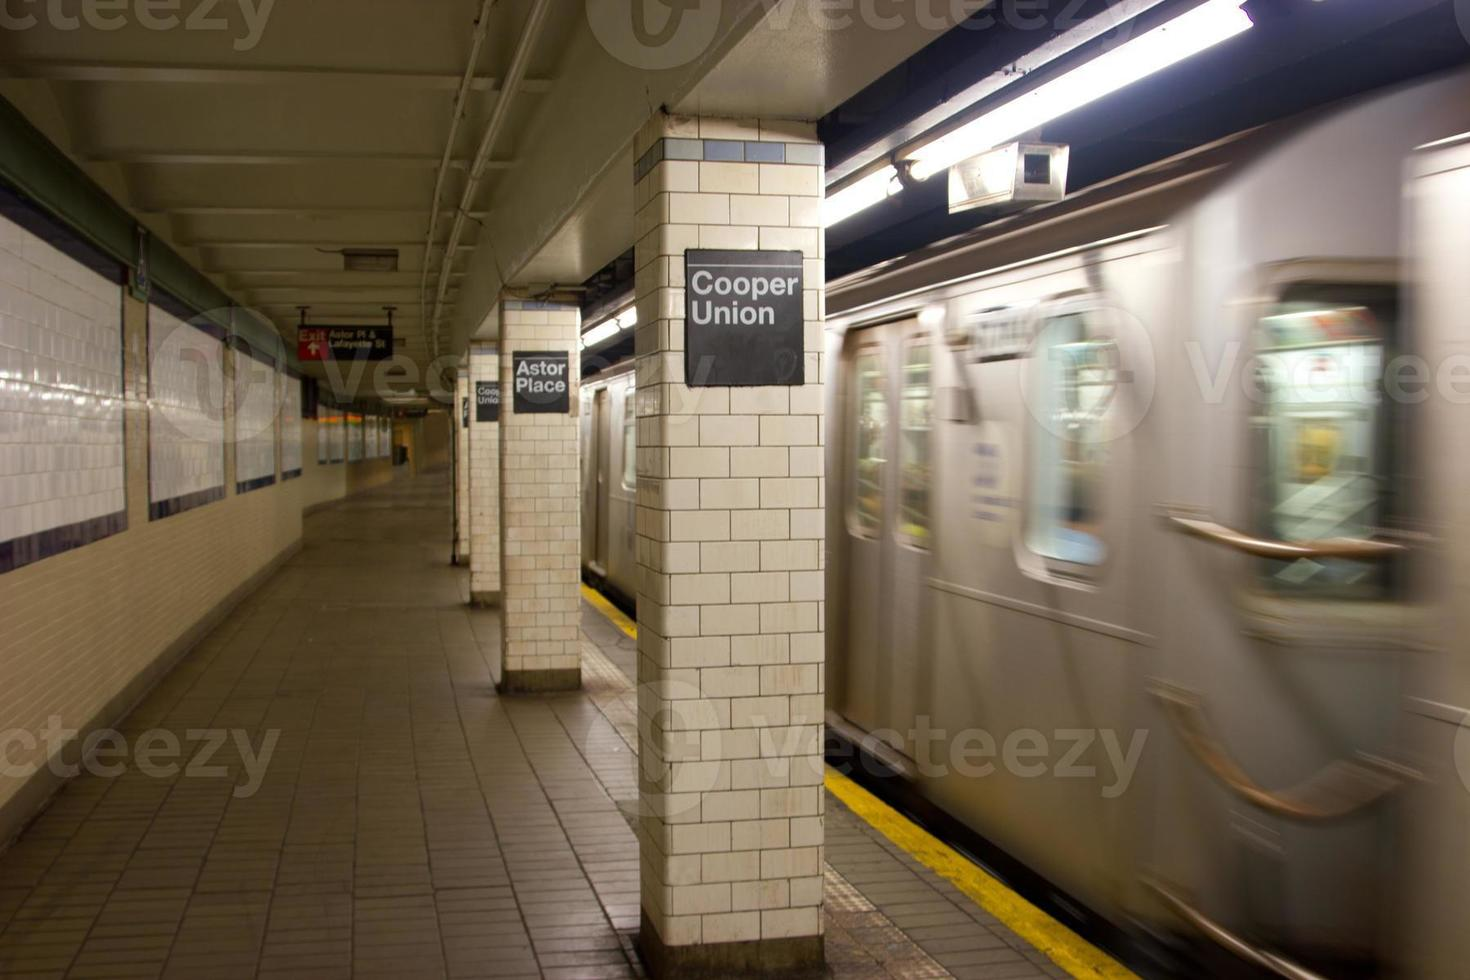 Cooper Union und Astor Place U-Bahnstation, NYC foto